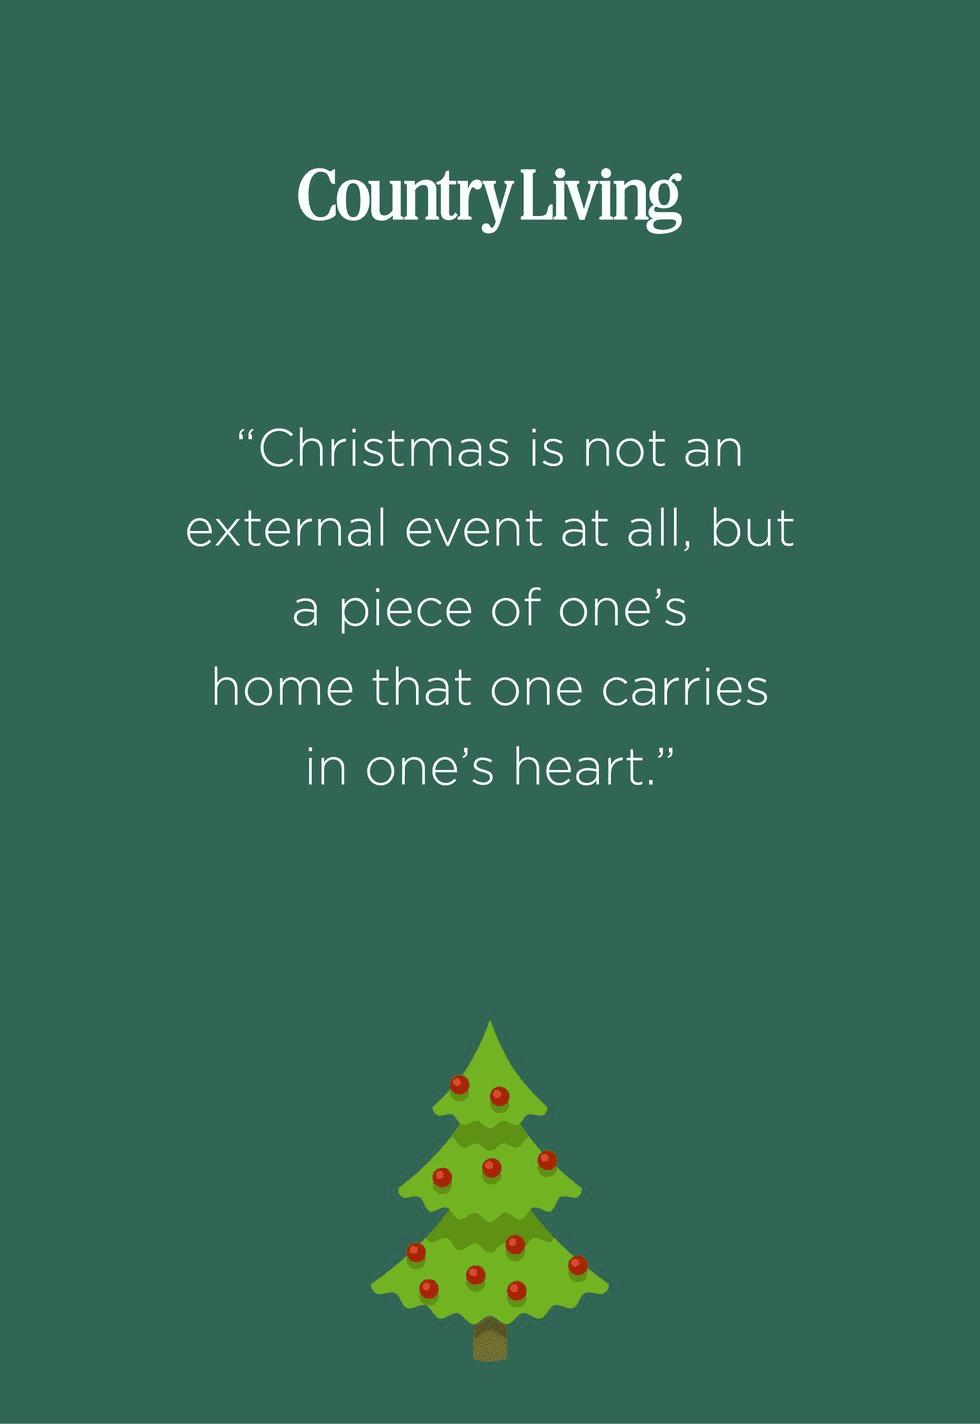 Mery Christmas Wishes 1